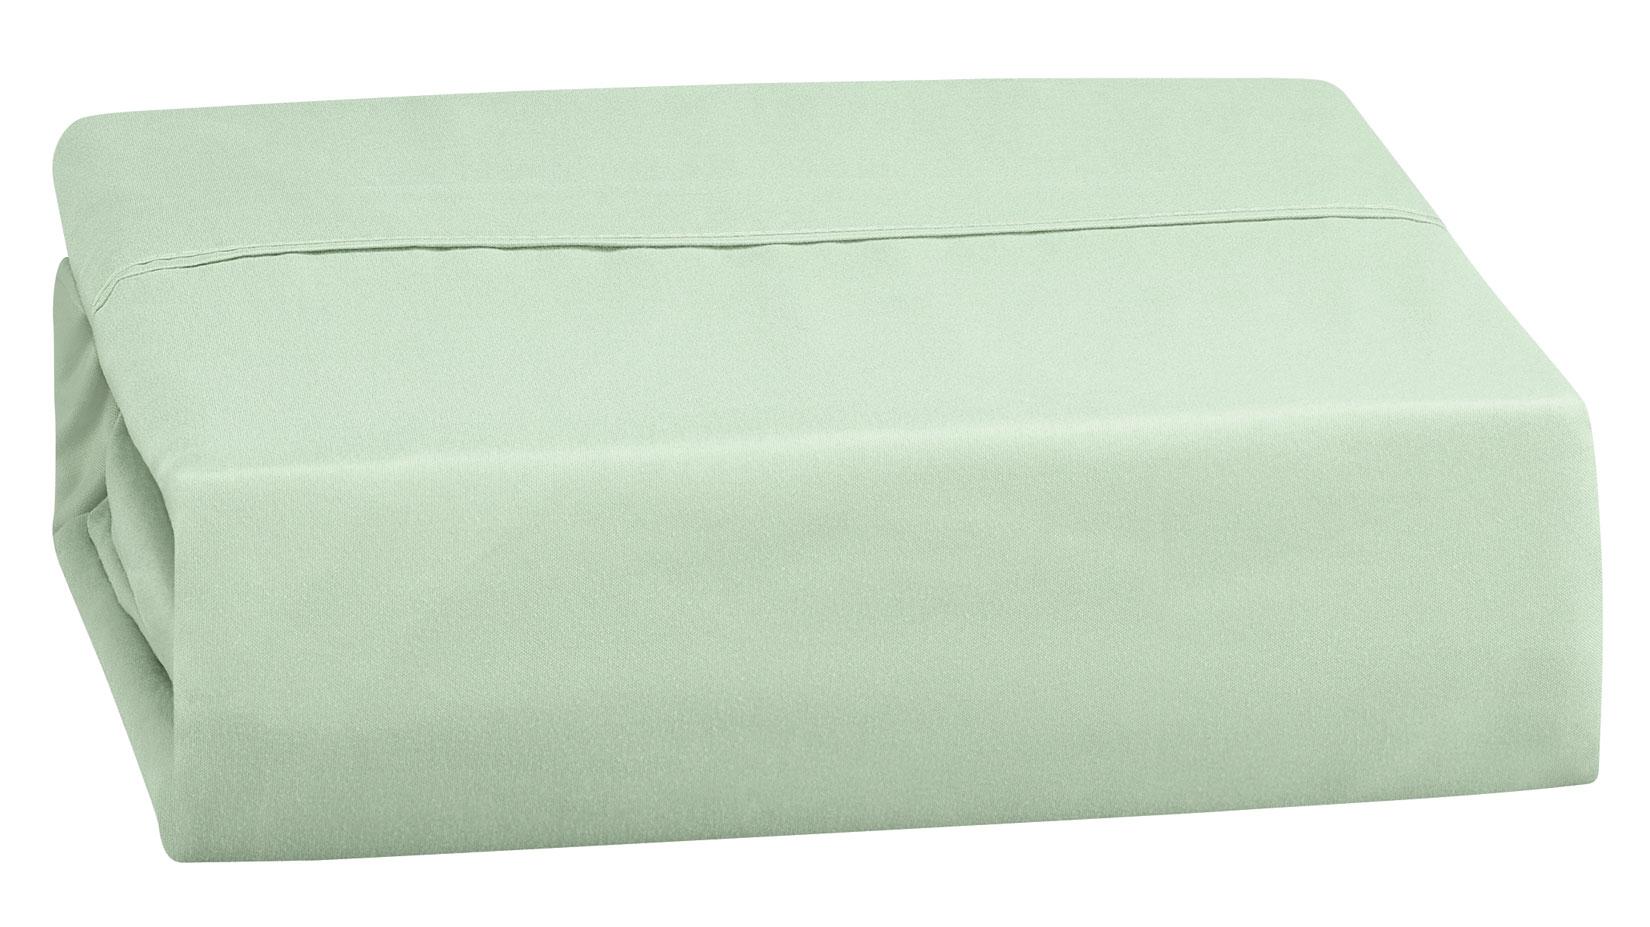 Luxurious-Microfiber-Sheet-Set thumbnail 4